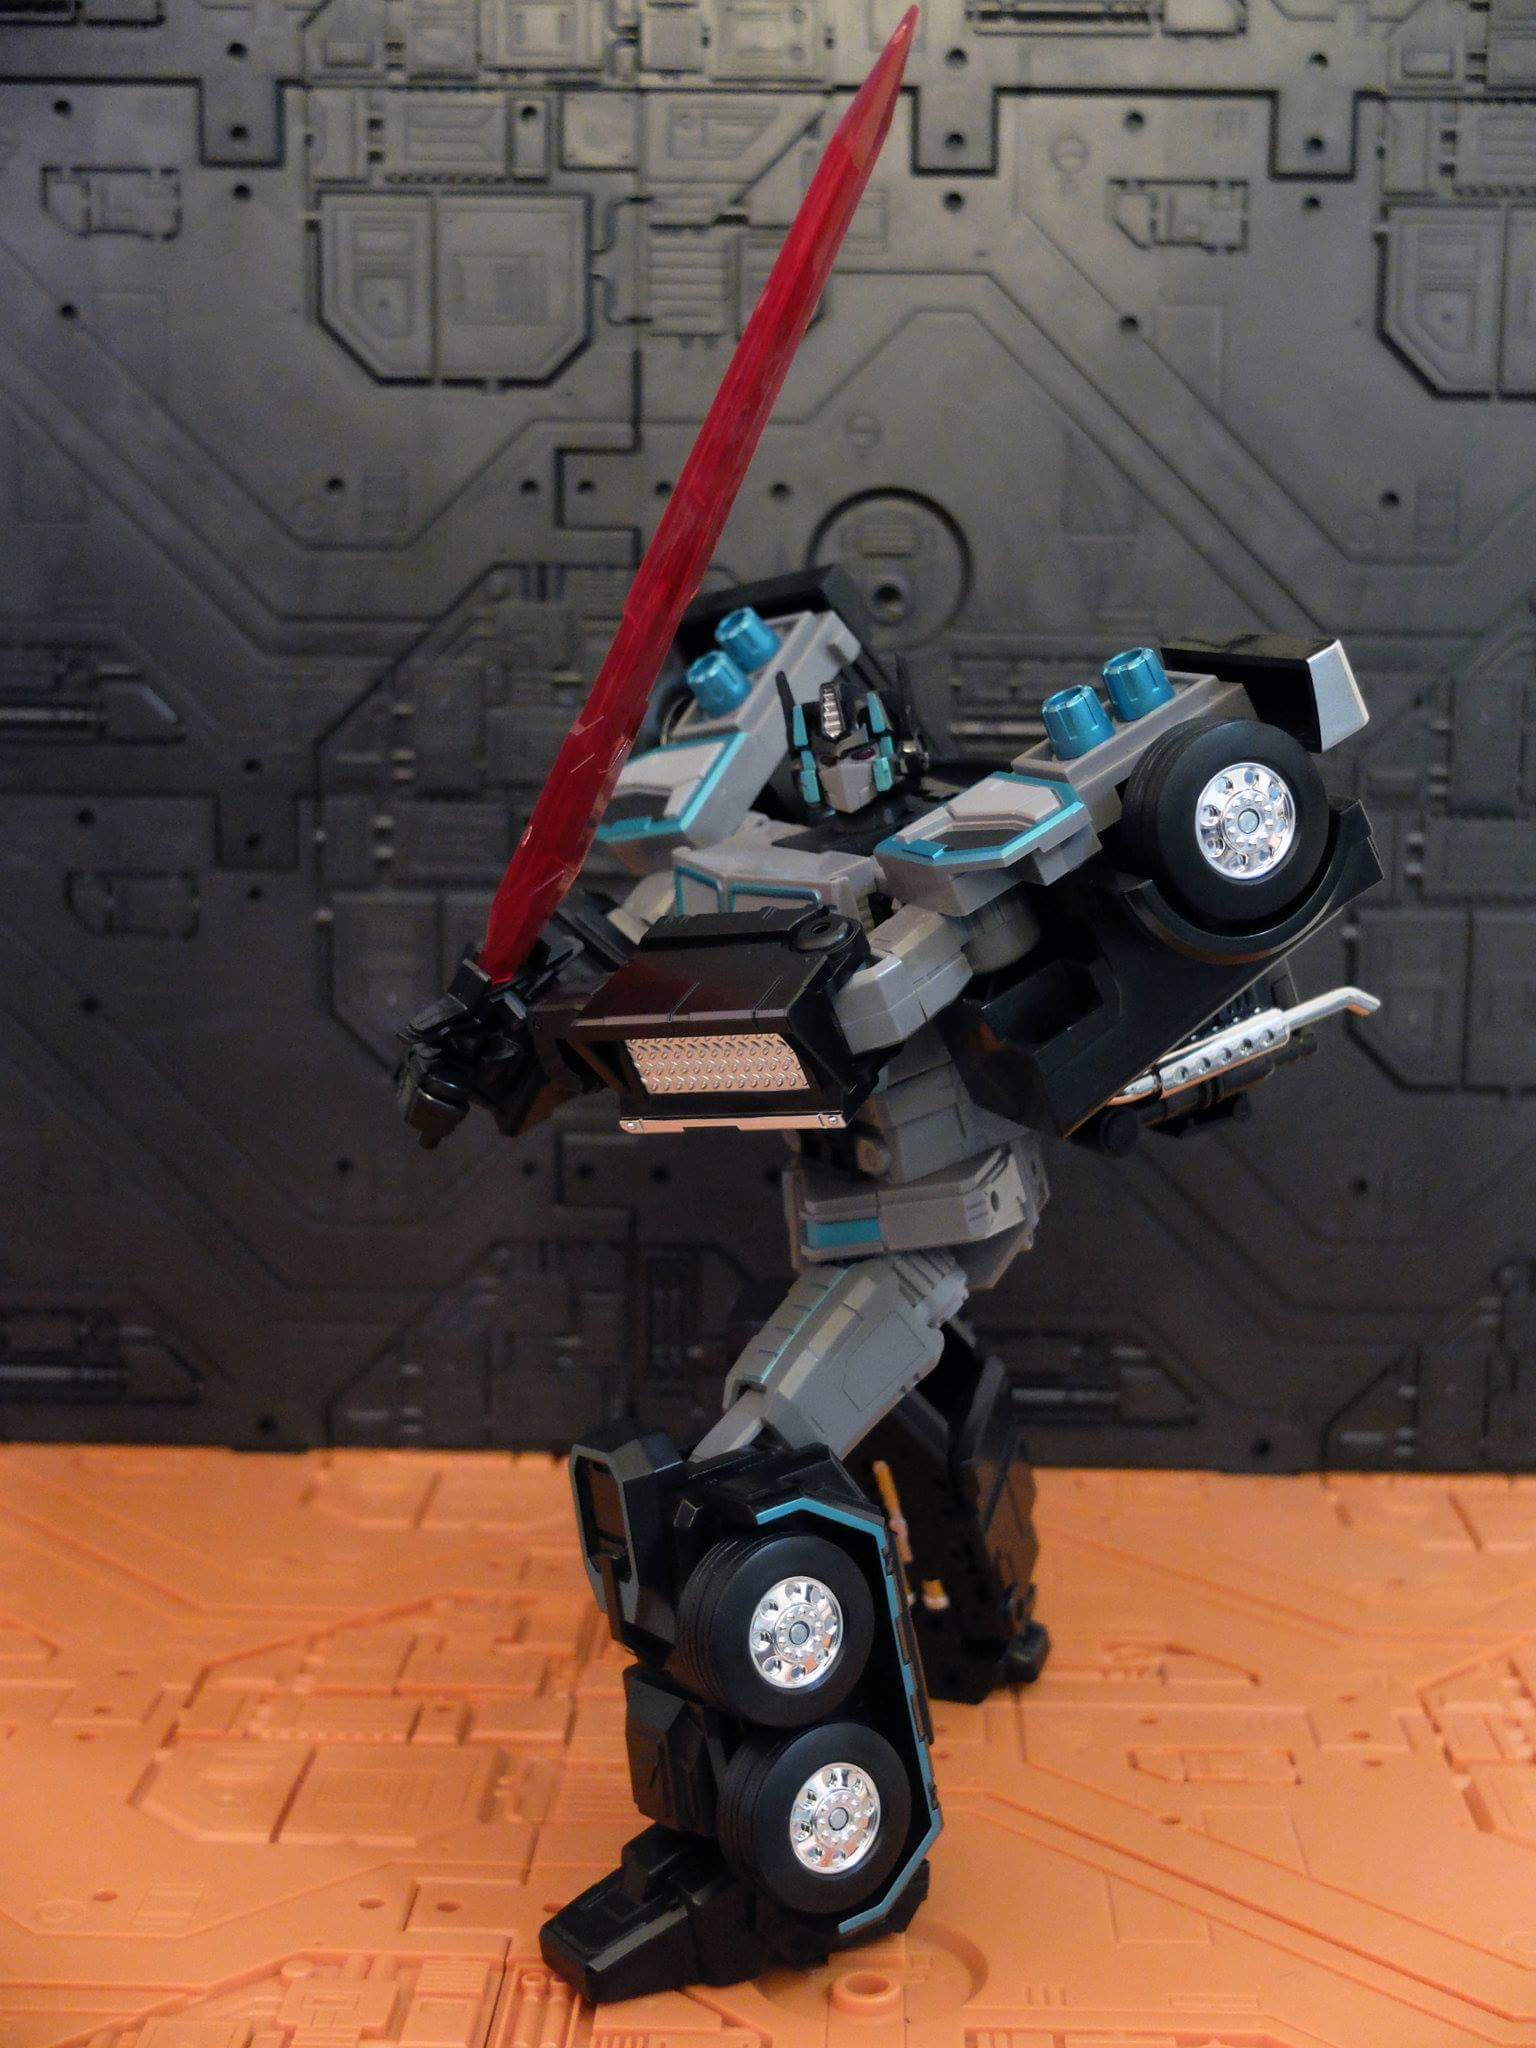 [FansHobby] Produit Tiers - Master Builder MB-01 Archenemy (aka Scourge RID 2000),  MB-04 Gunfighter II (aka Laser Optimus G2) et MB-09 Trailer (remorque) JwNIXijr